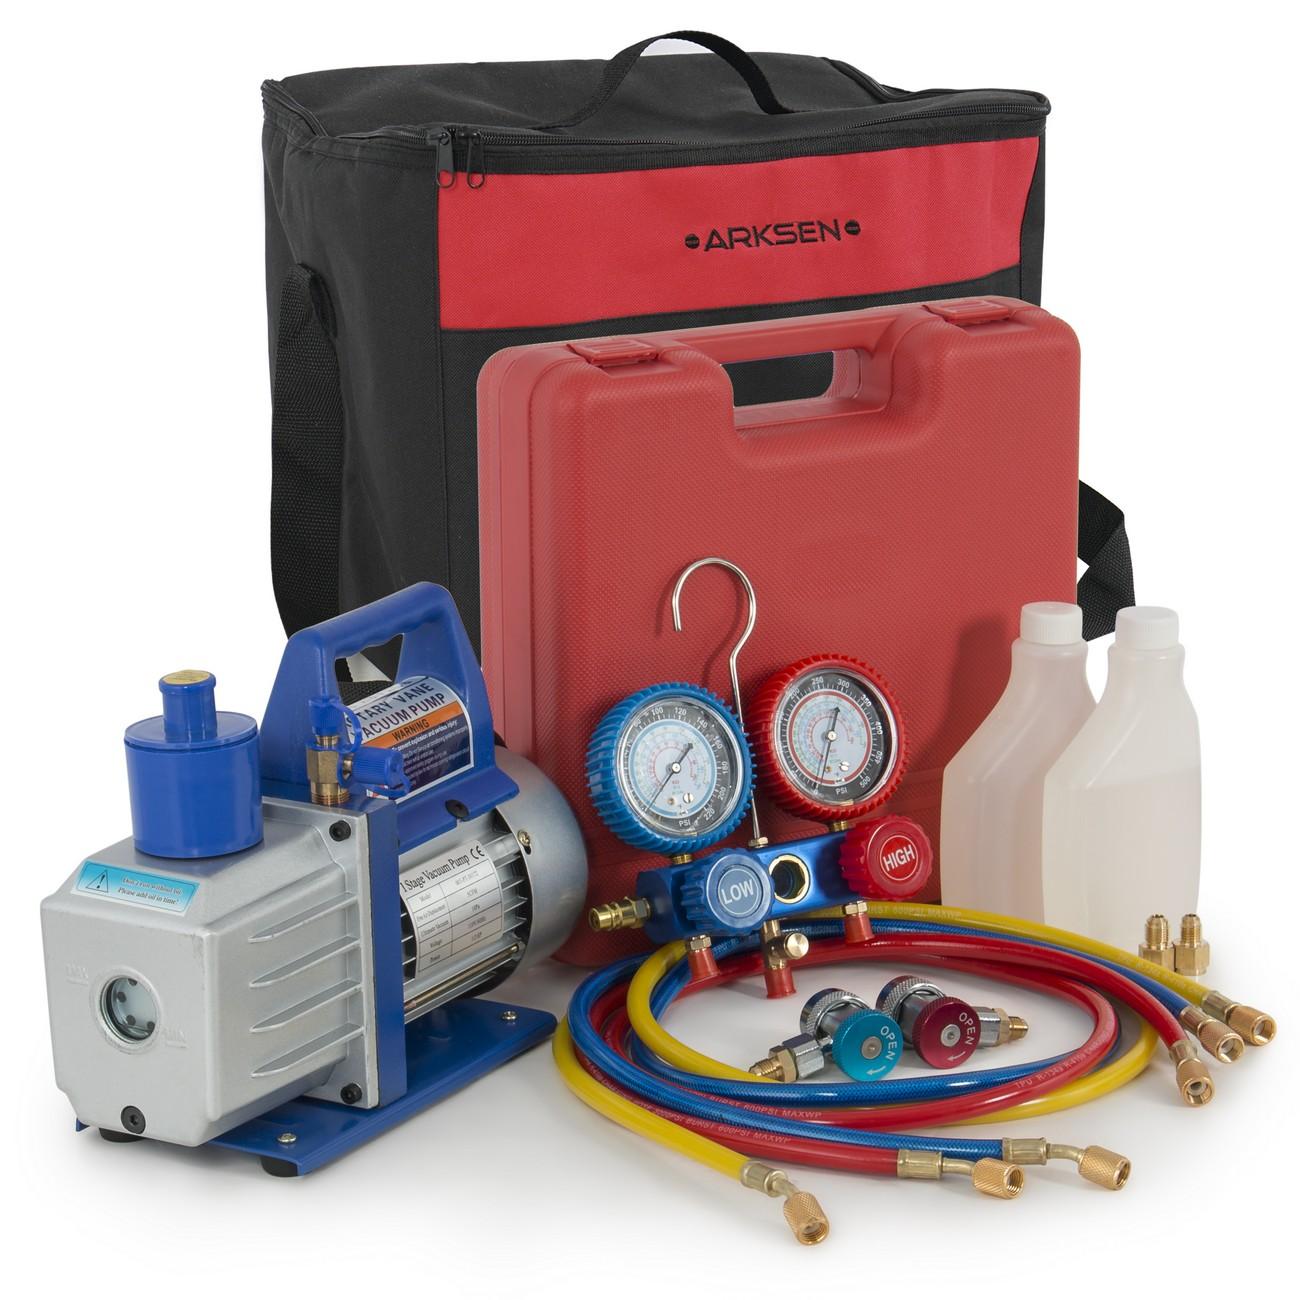 ARKSEN 1/2HP Vacuum Pump R134a Manifold Gauge Diagnostic Refrigerant w/ Carrying Tote Combo Set